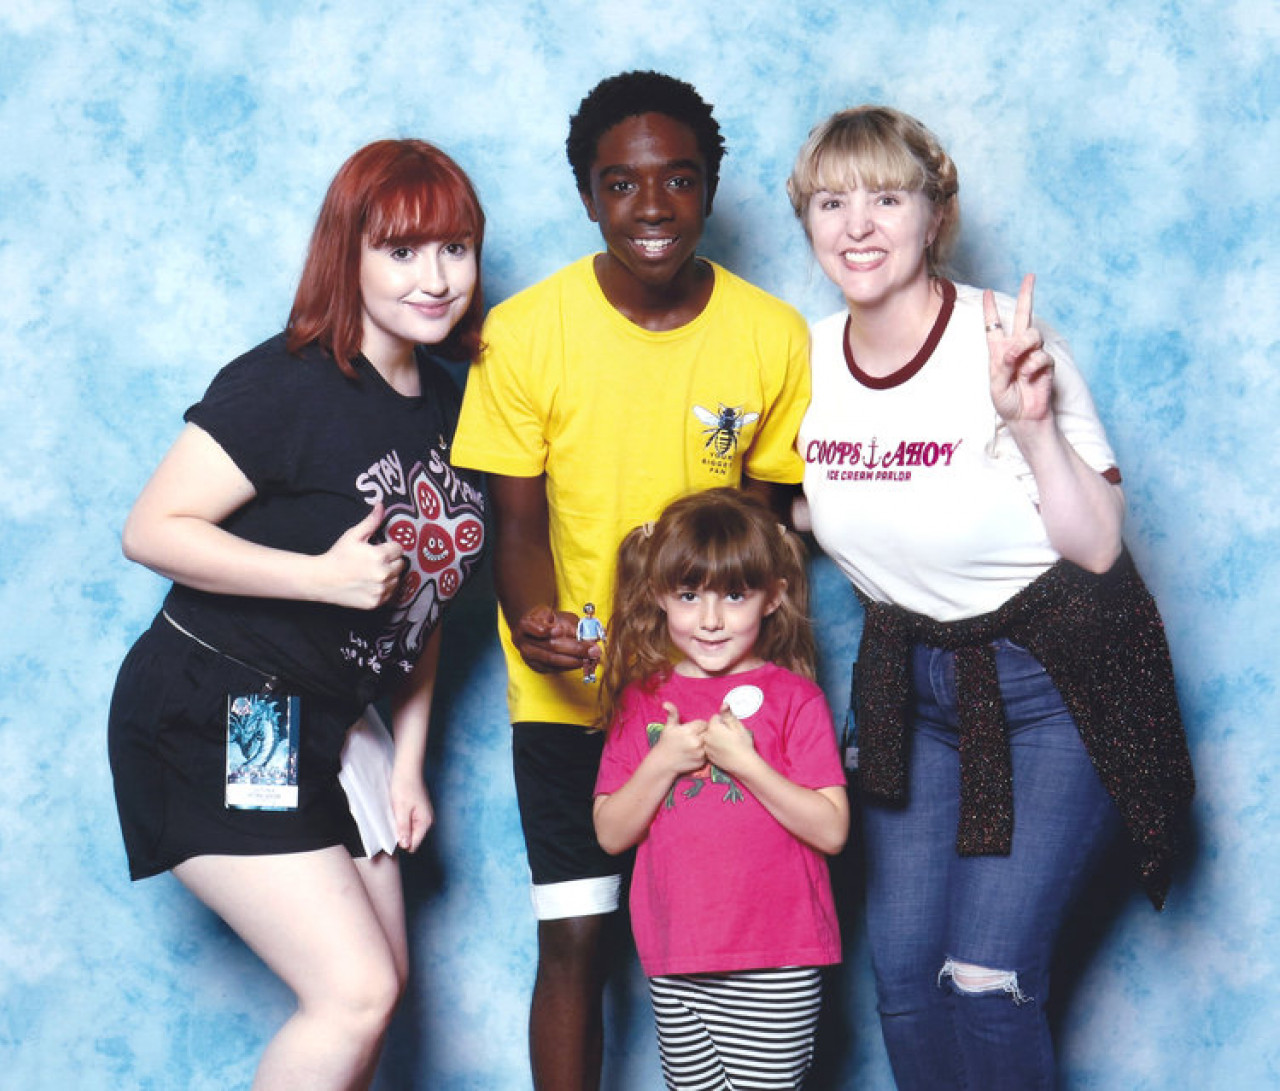 Tori, 'mascot' Kilby and Ash with Caleb McLaughlin (Lucas).